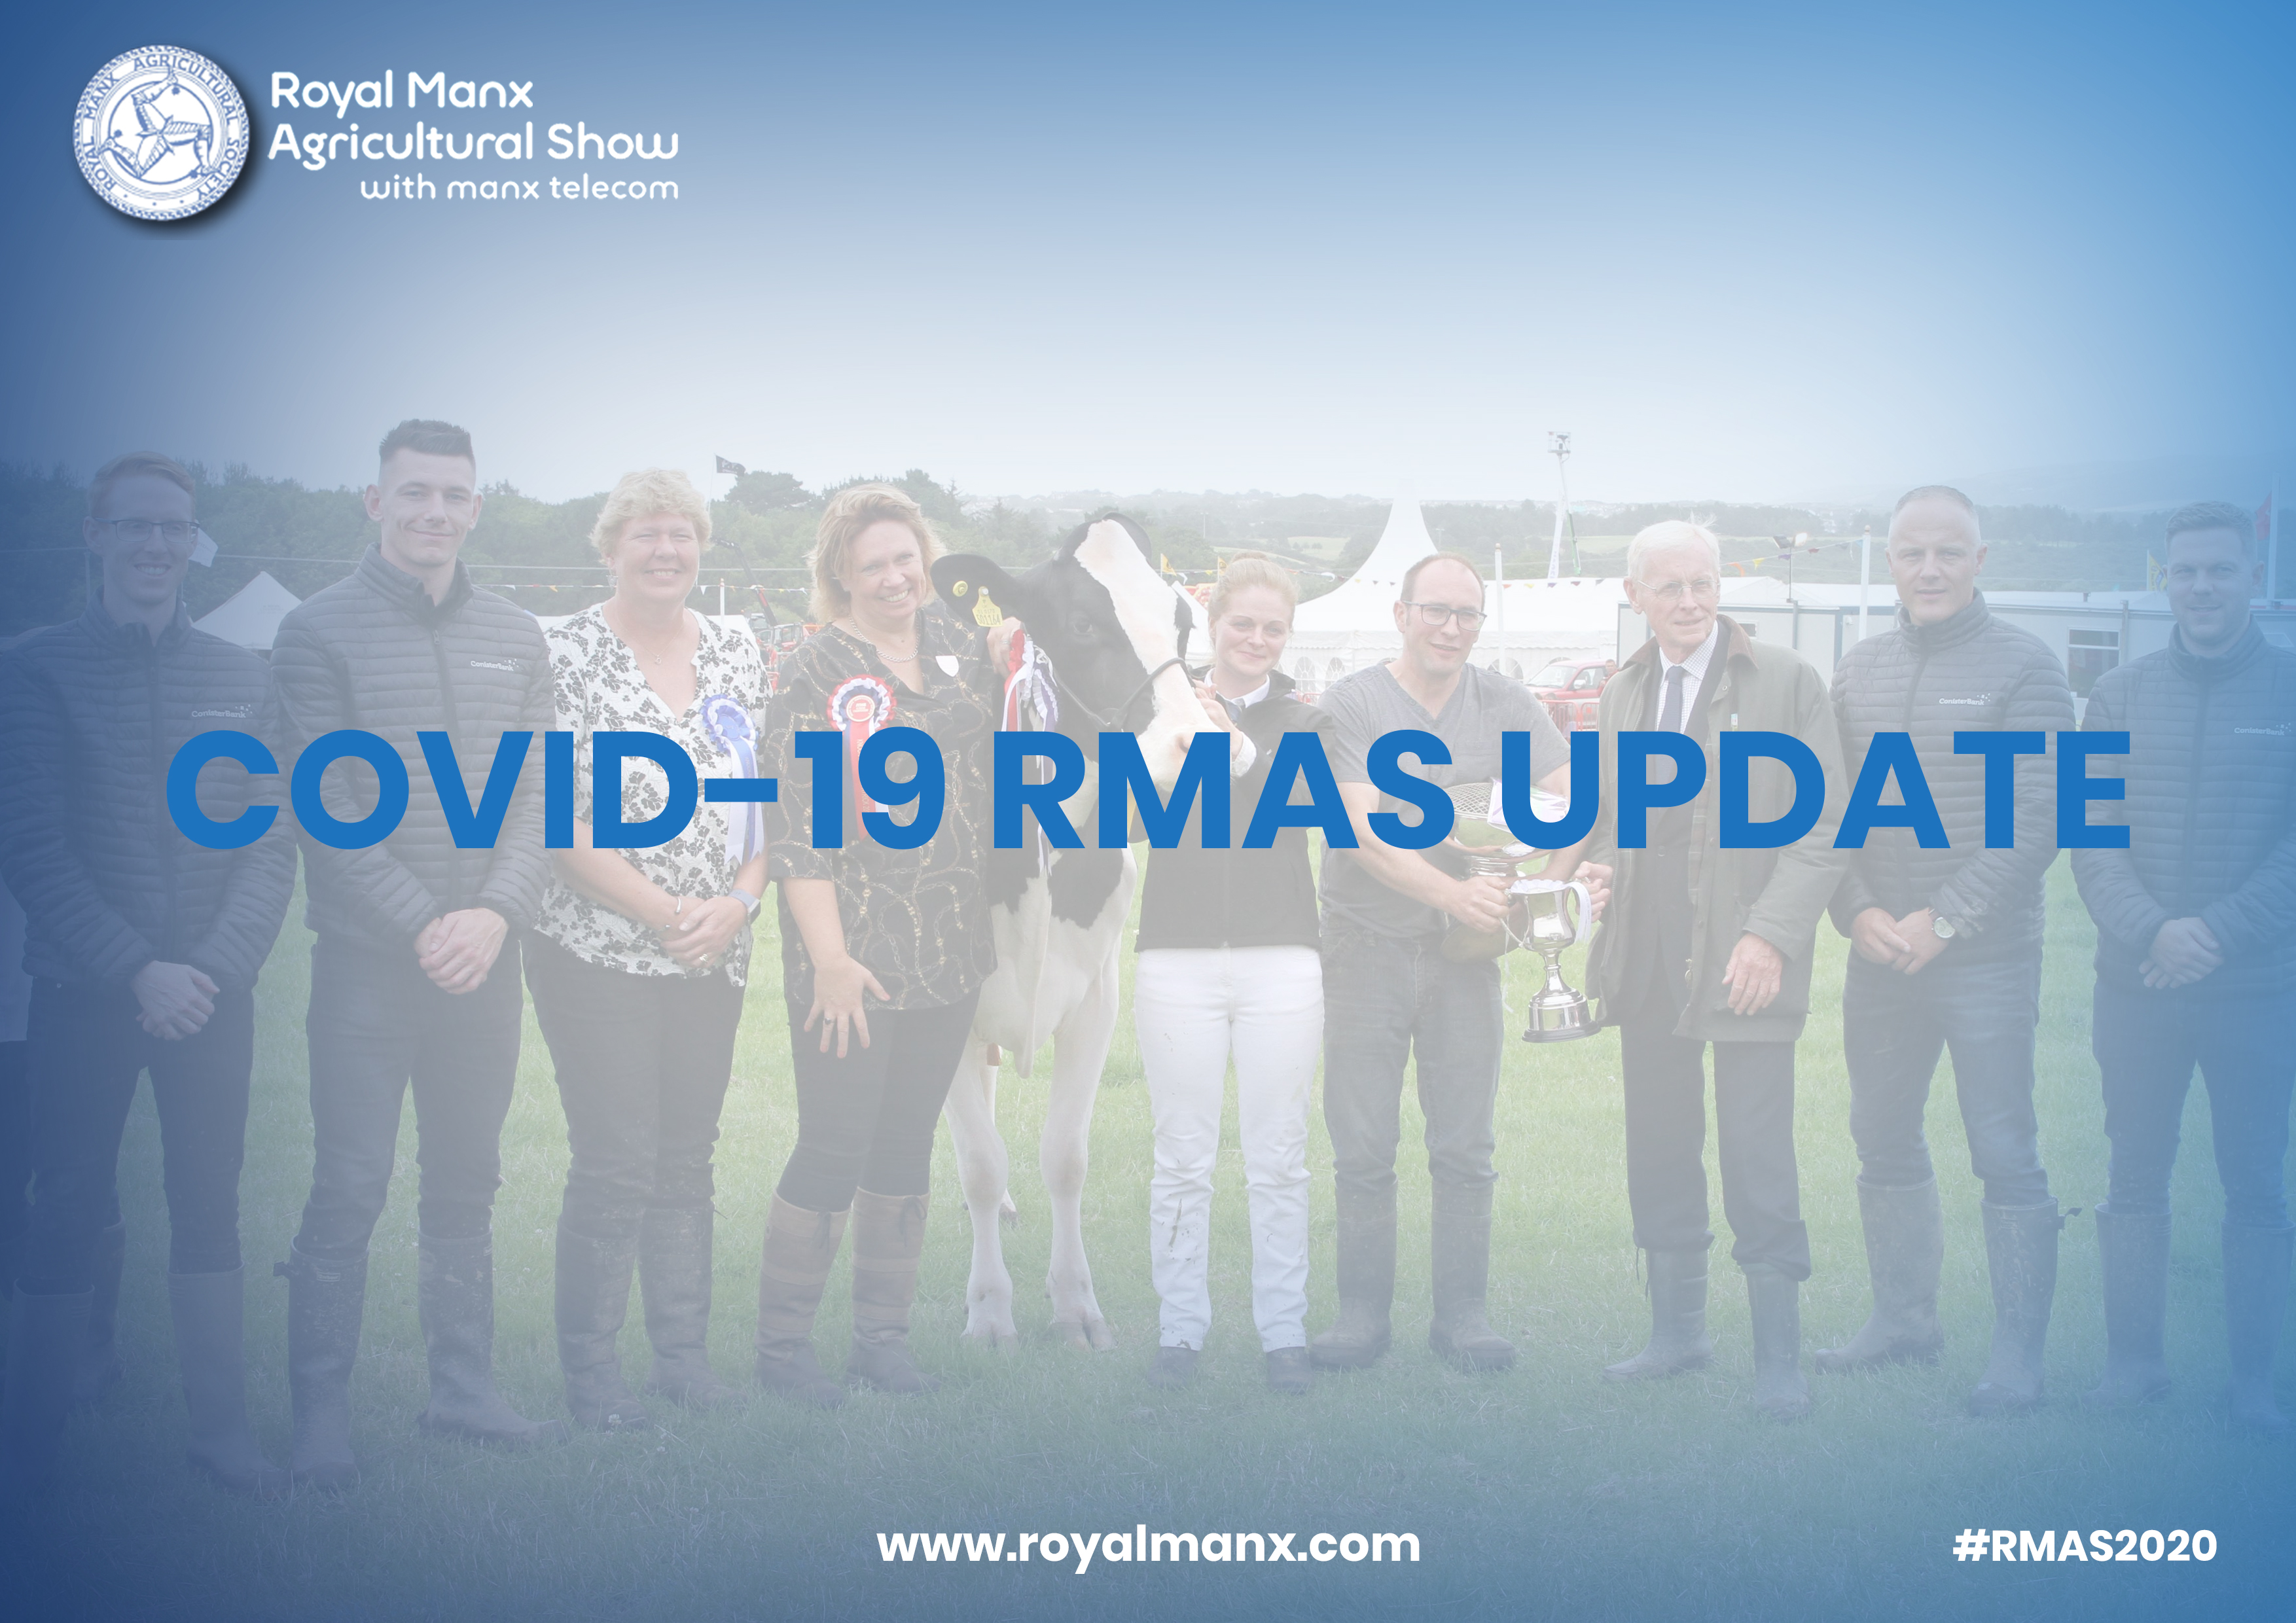 COVID-19 RMAS UPDATE